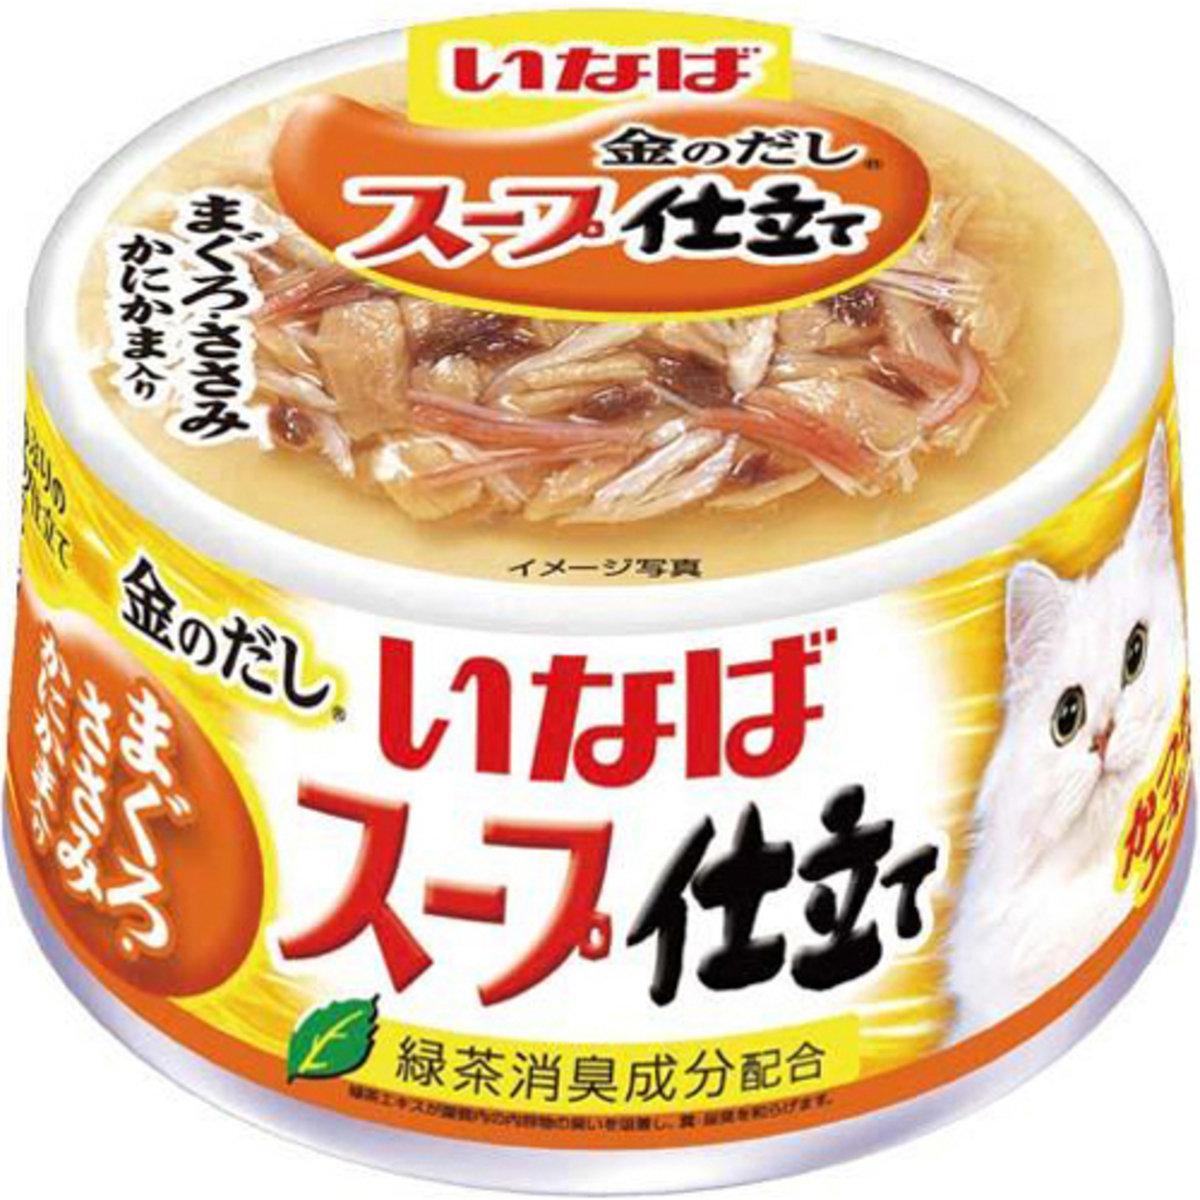 INABA 綠茶雞肉鰹魚鮪魚蟹柳 IM-233 80g